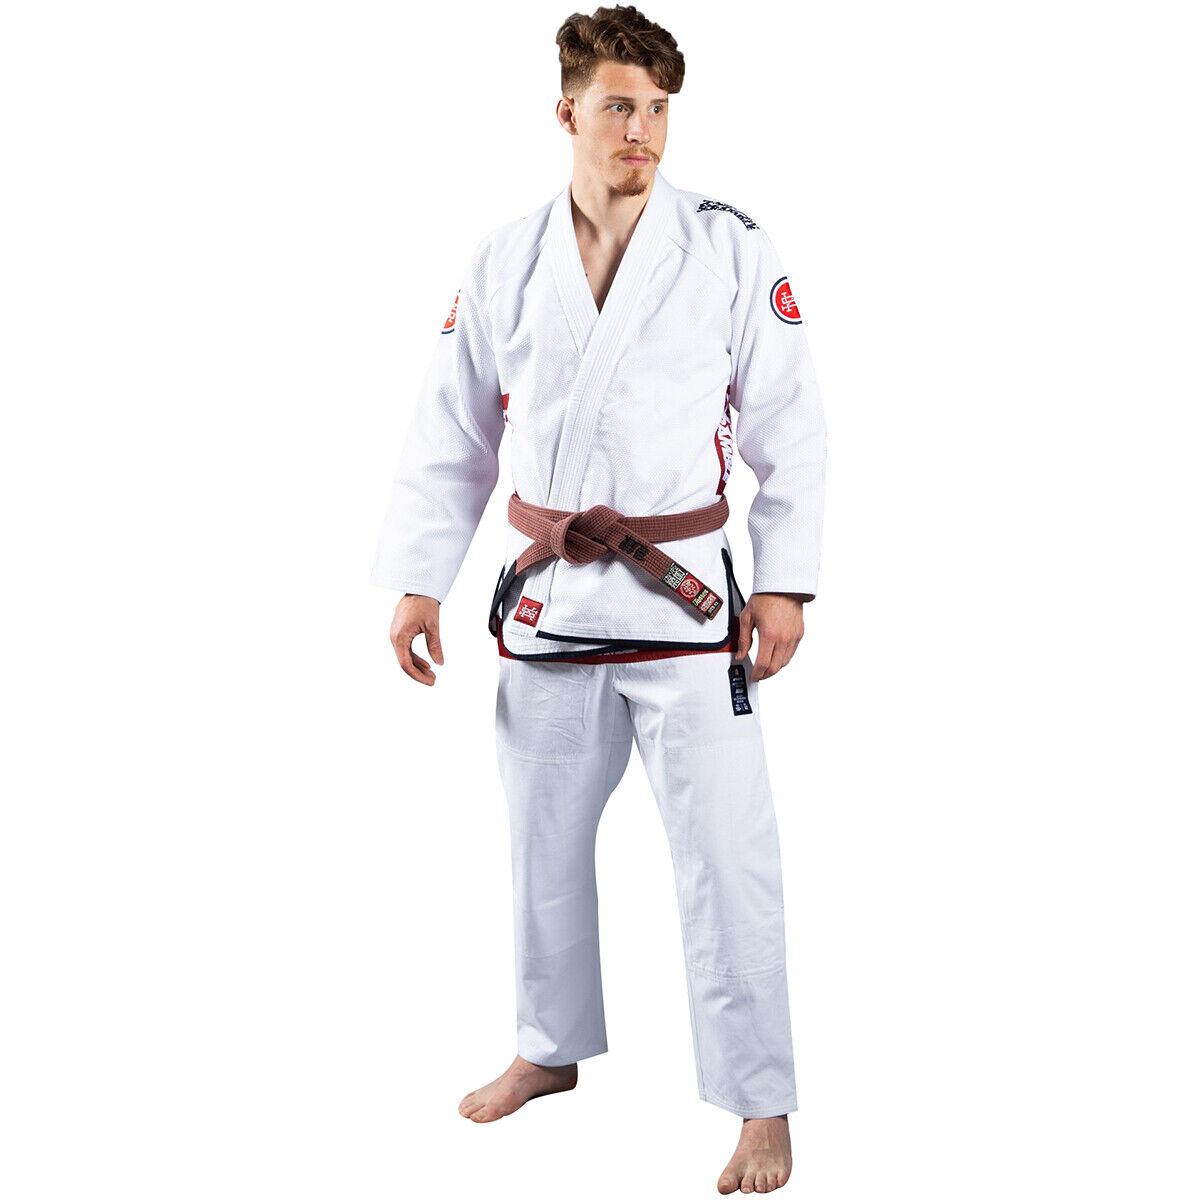 Scramble Athlete 4 Luxury 550gsm brasilianischer Jiu-Jitsu Gi